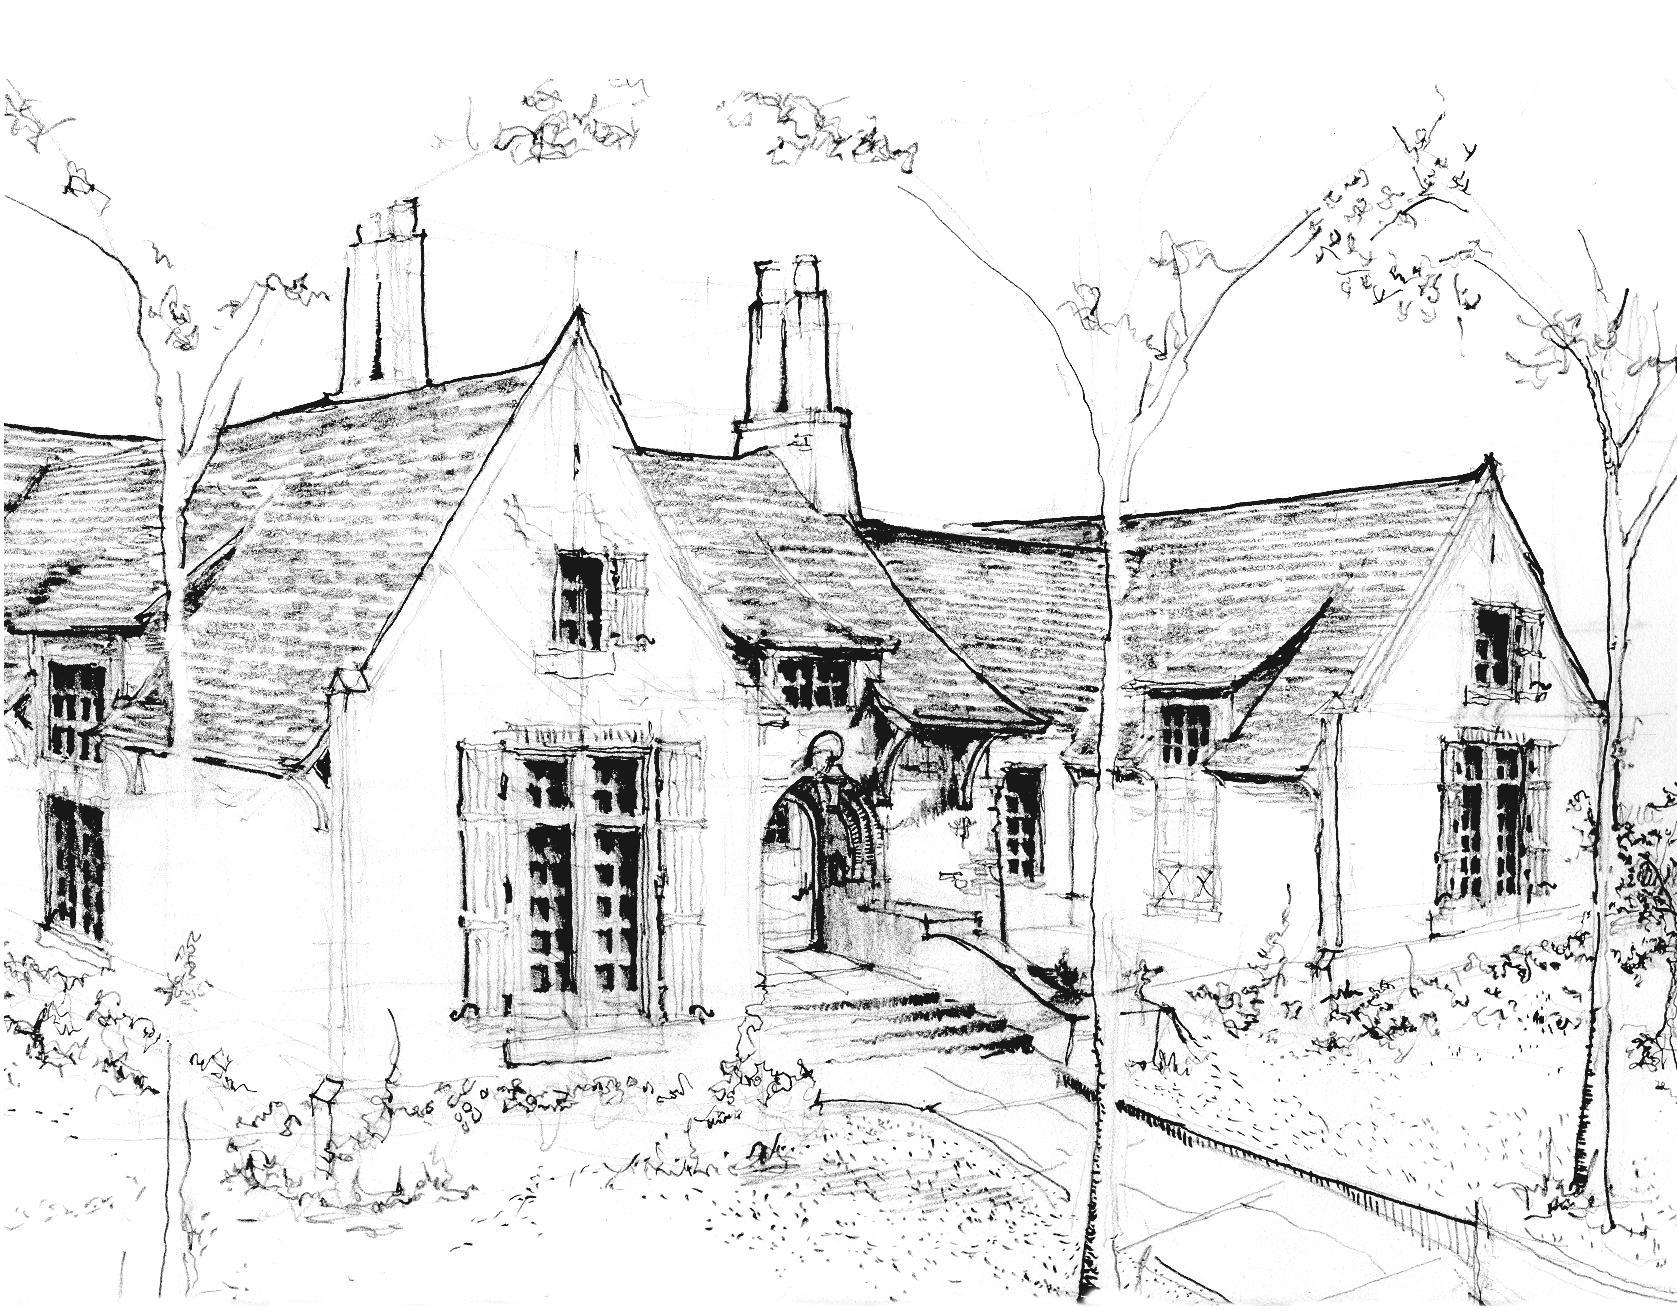 Dennis sketch - large canvas.jpg